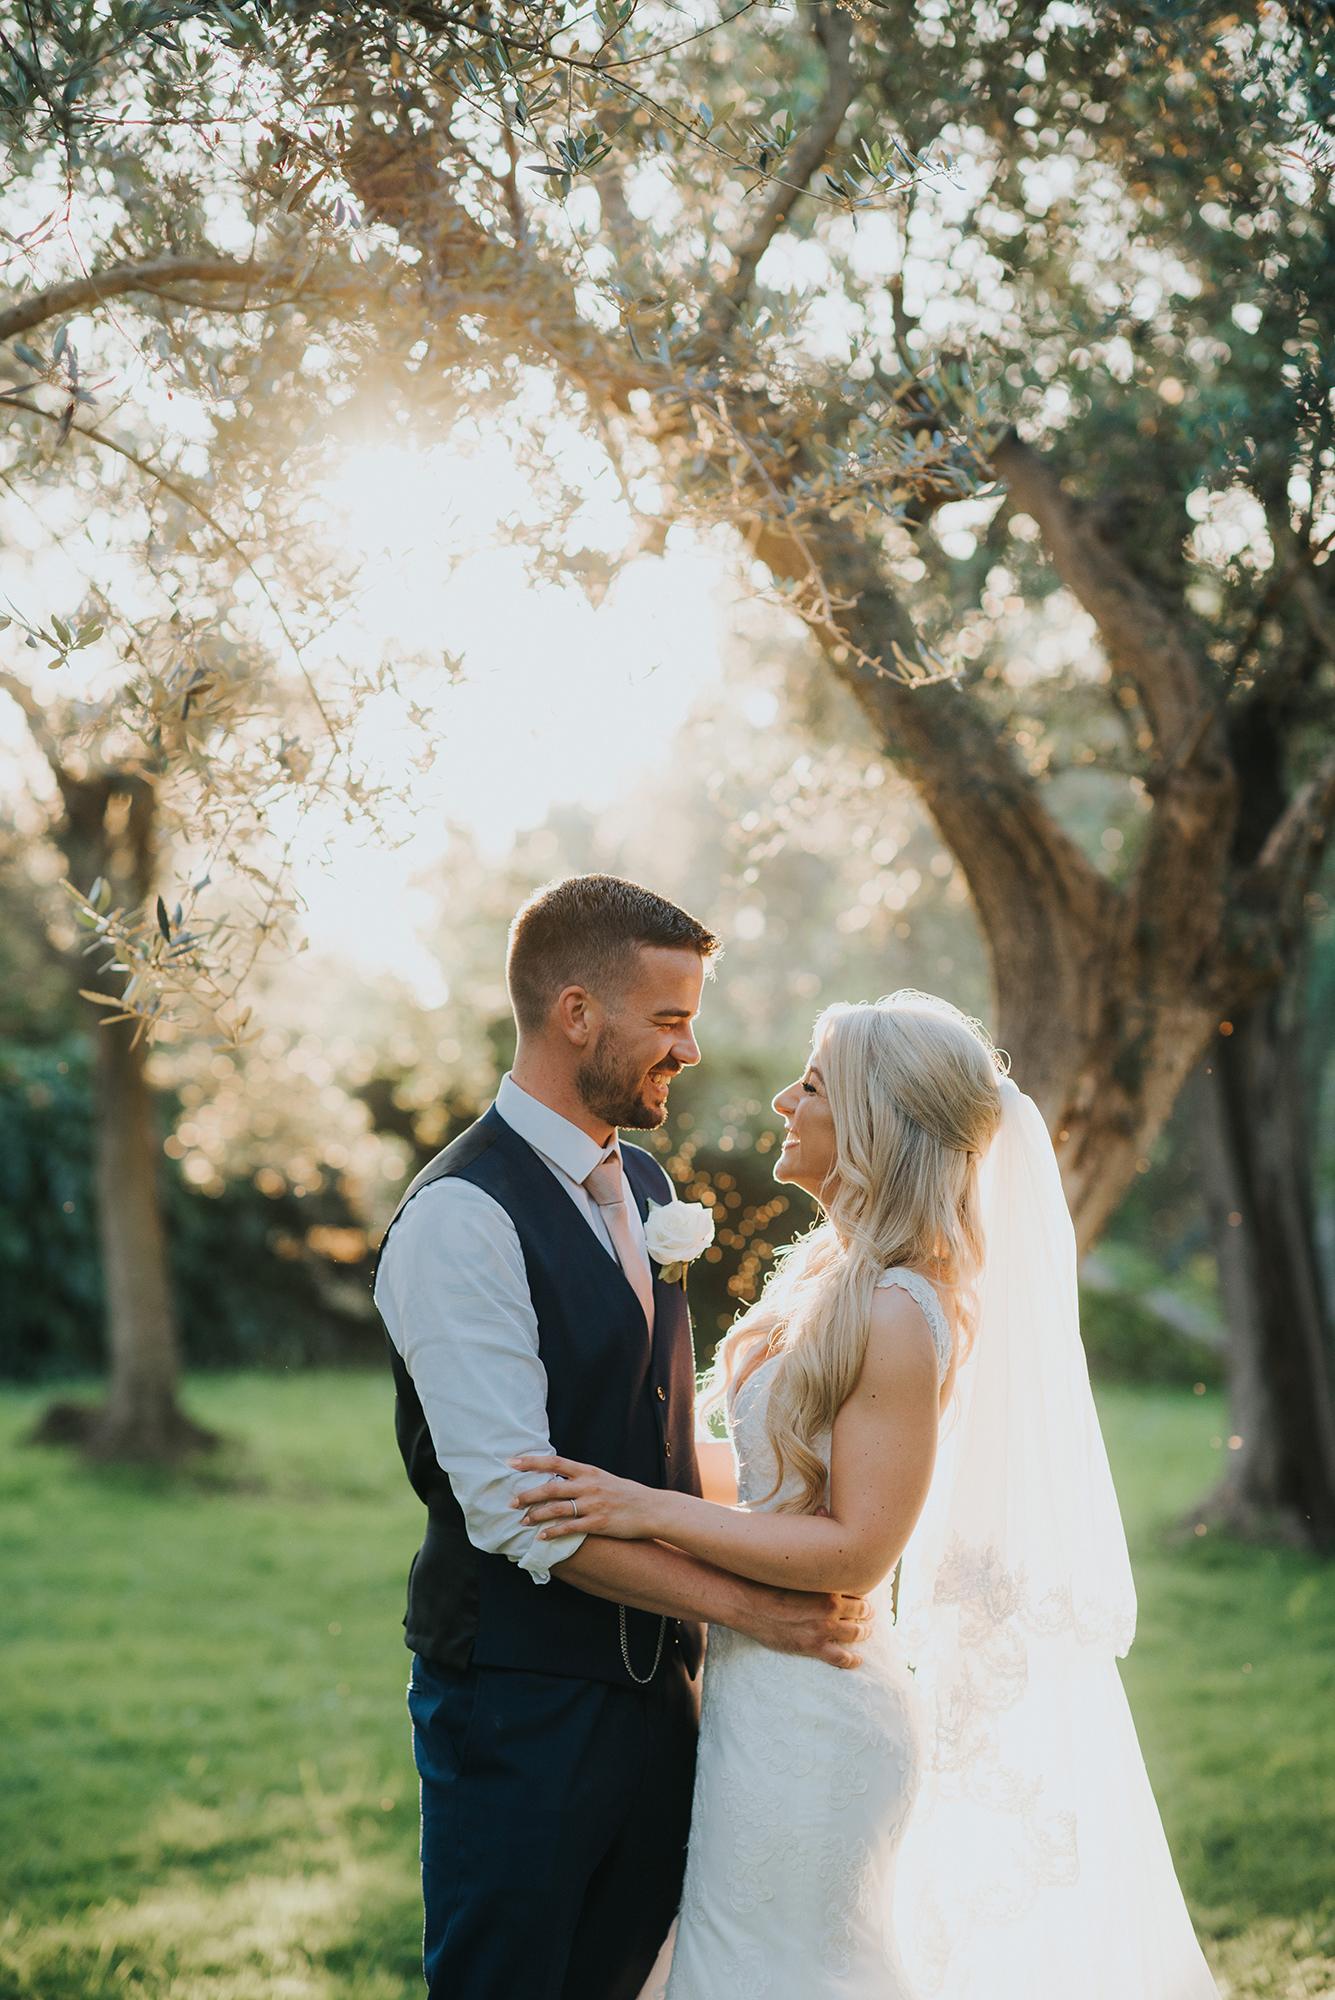 Sorrento wedding photographer 44